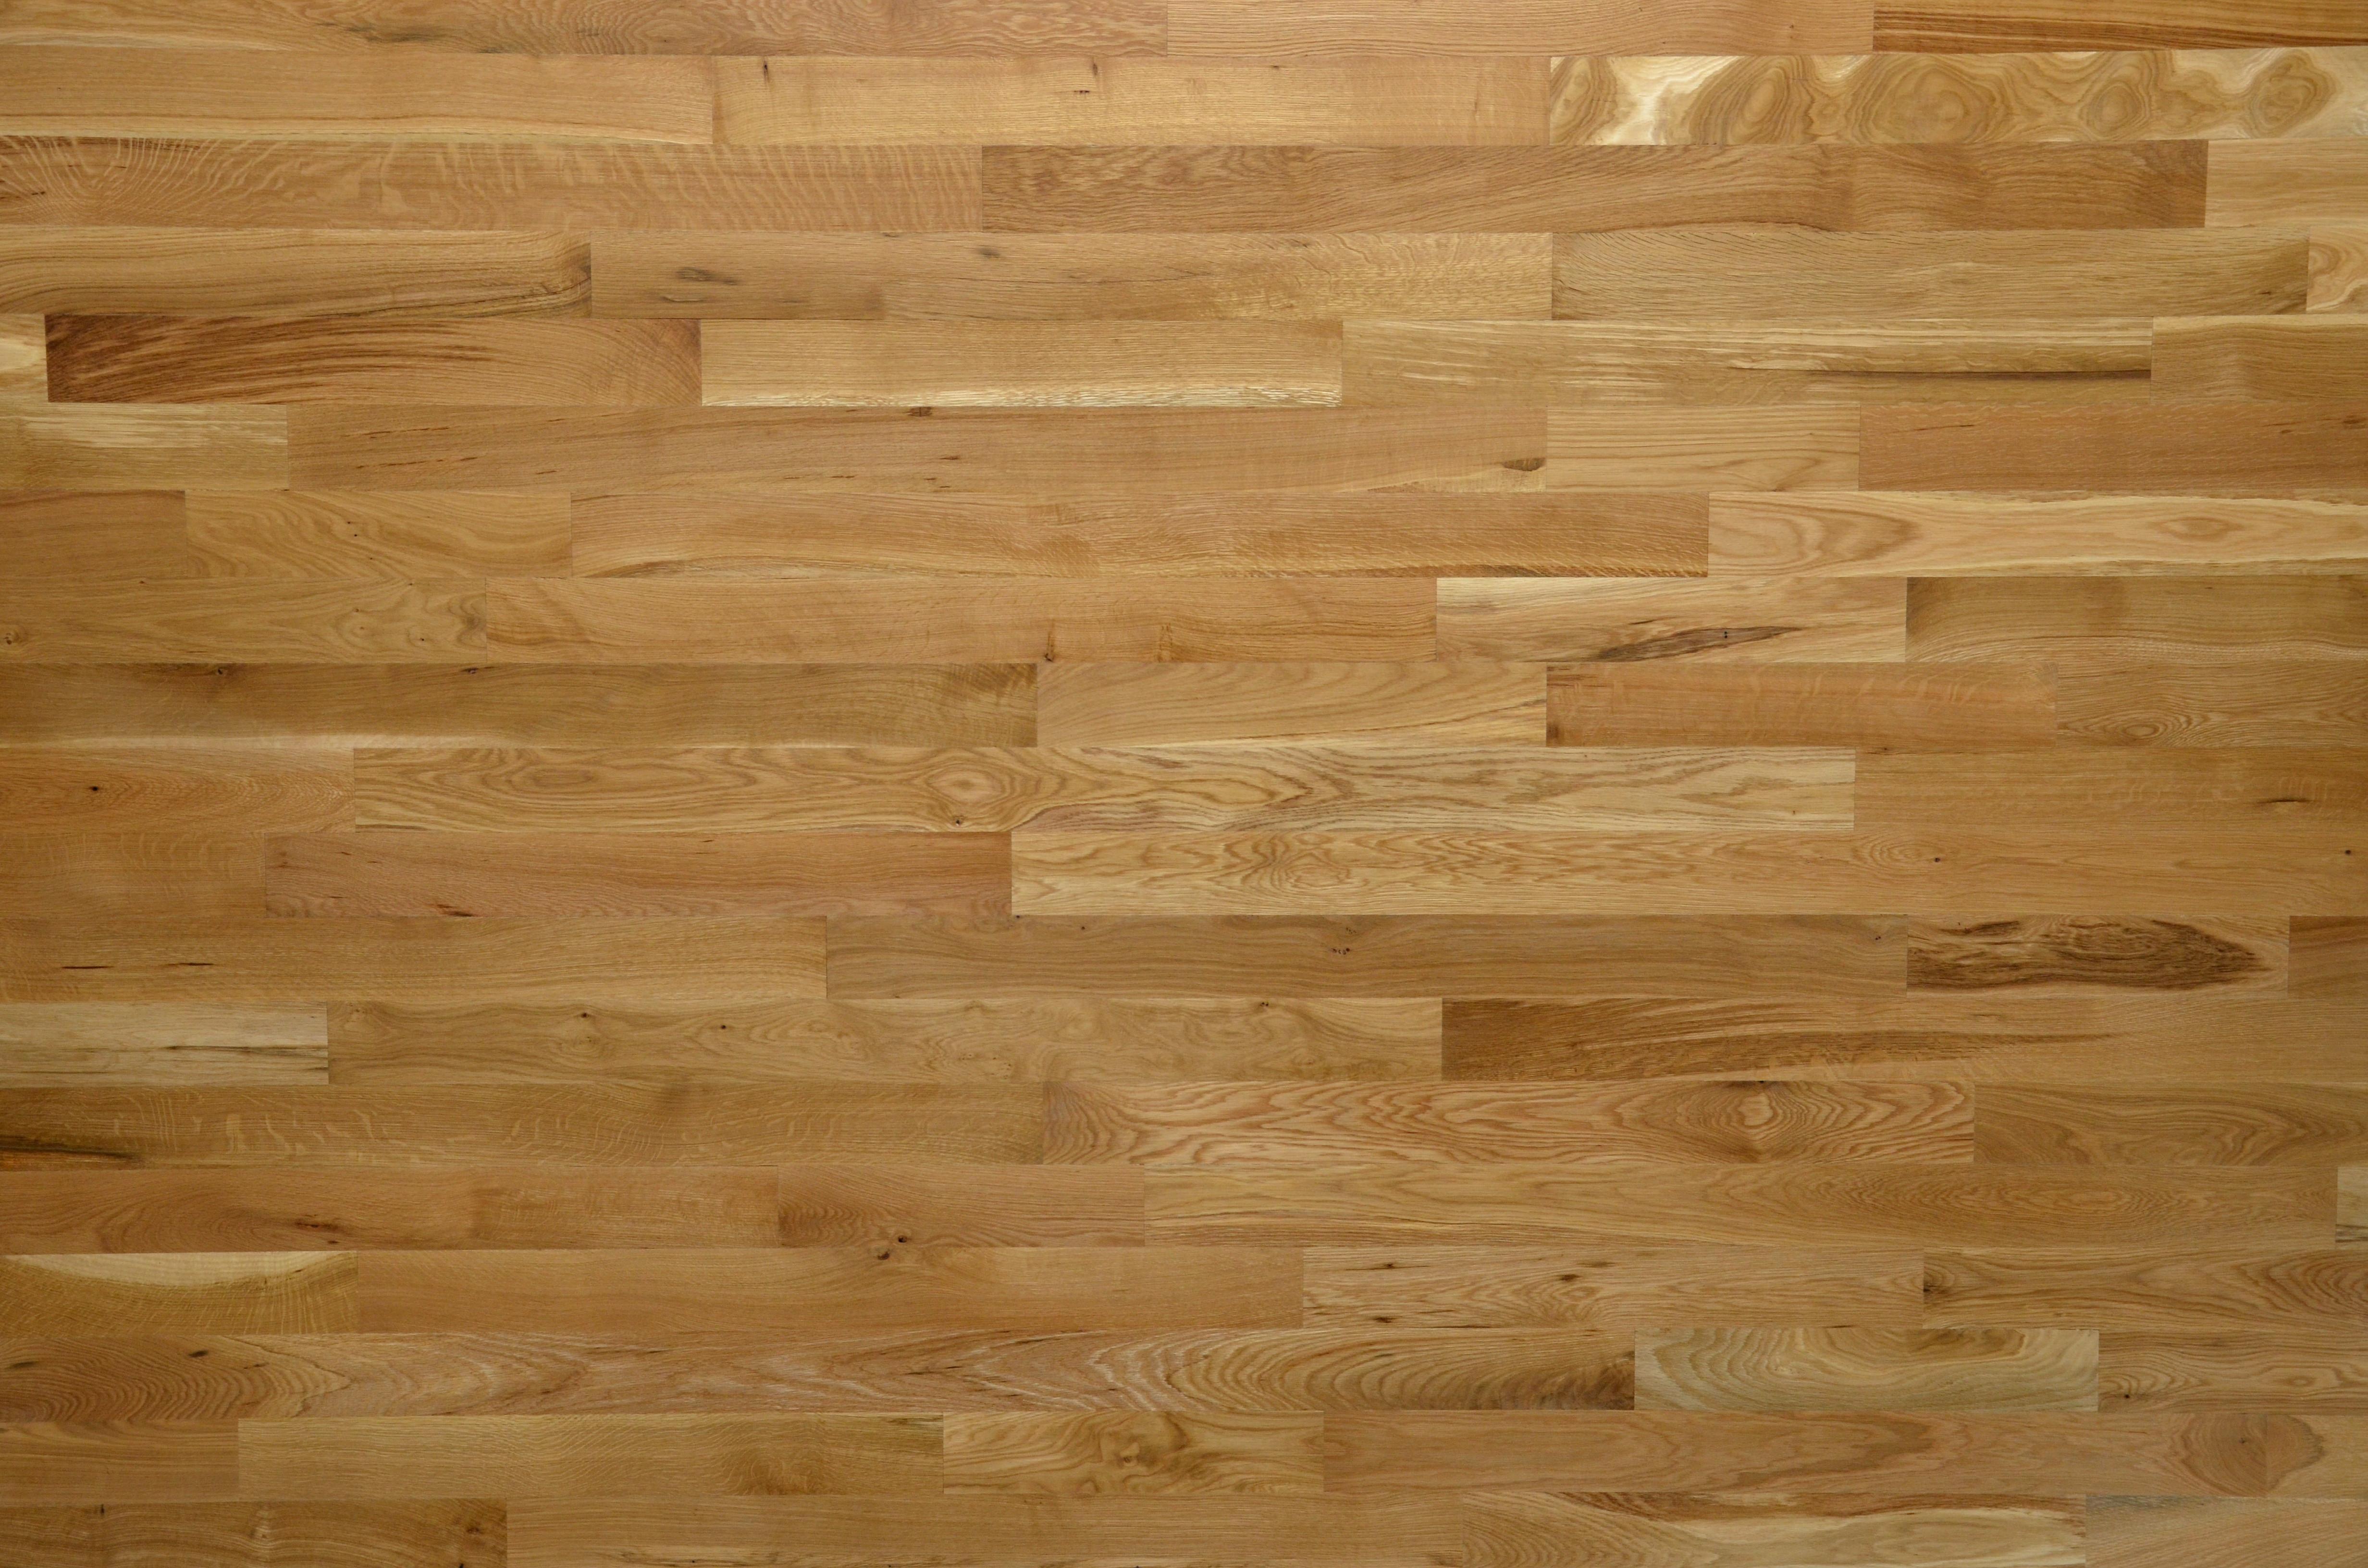 european oak hardwood floors of lacrosse hardwood flooring walnut white oak red oak hickory pertaining to 1 common white oak